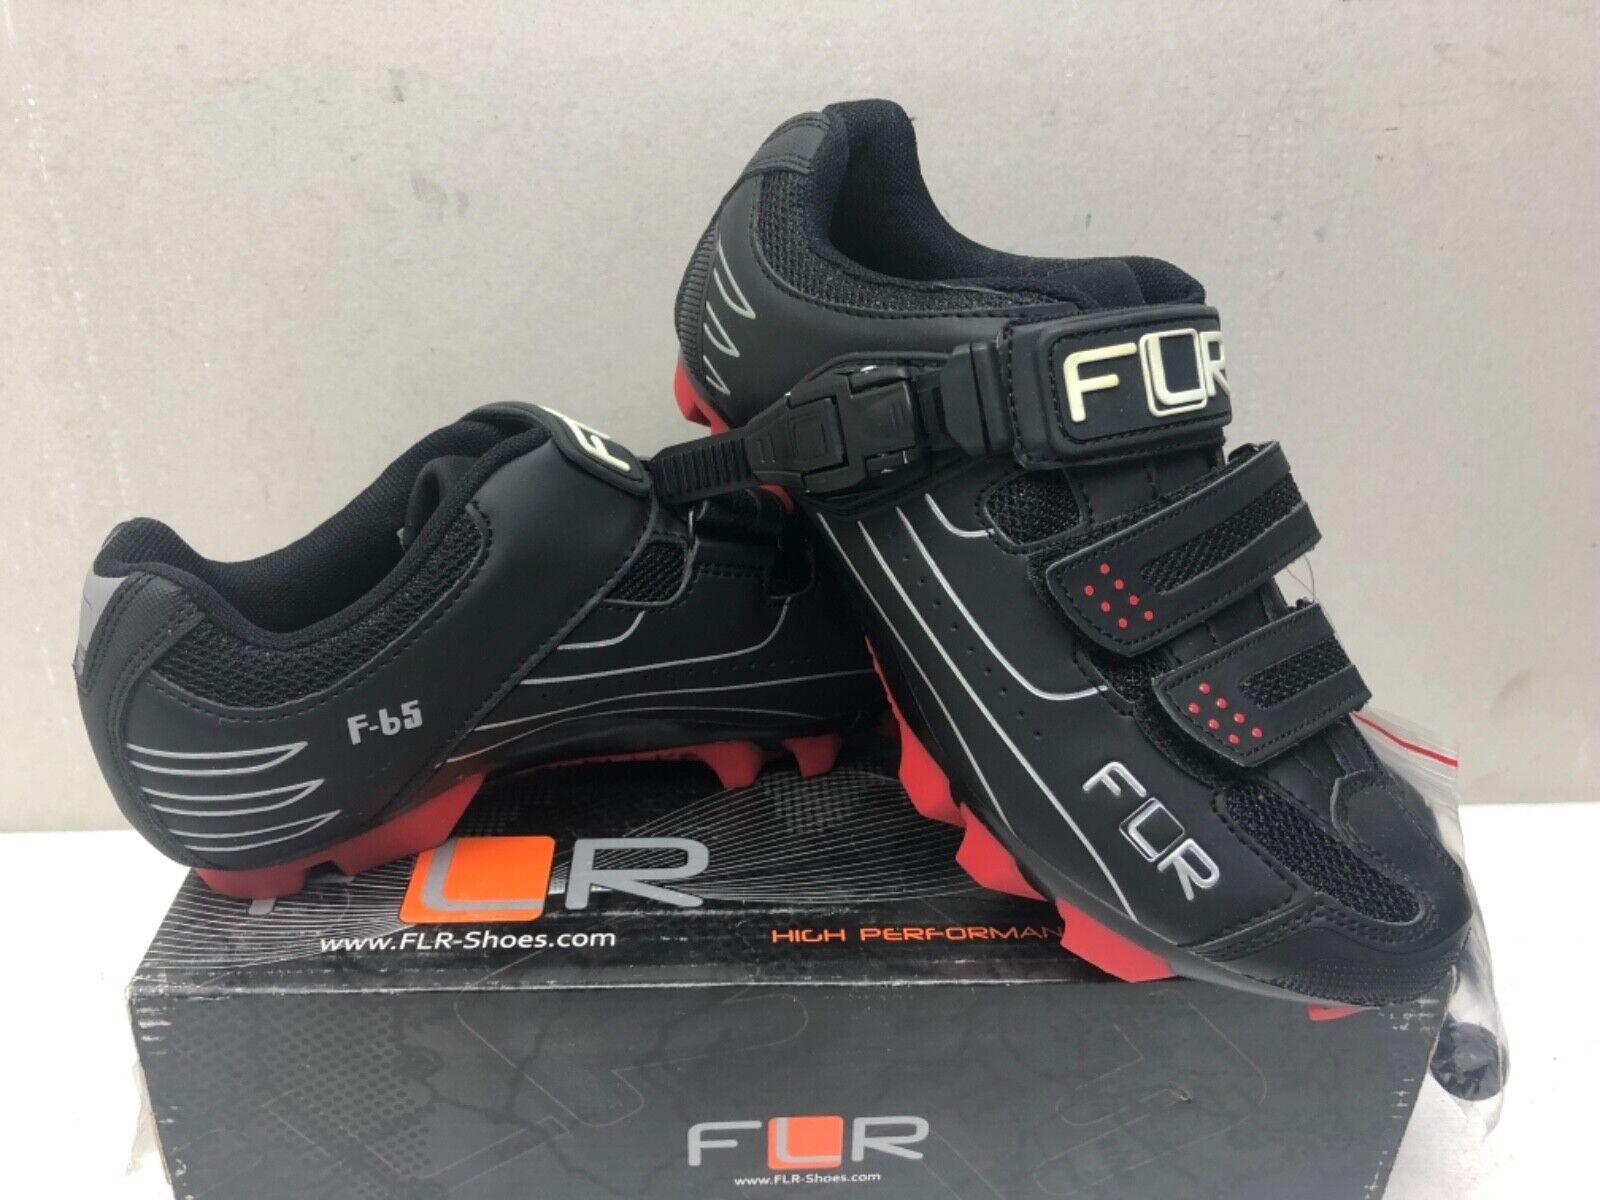 FLR F65 Scarpe MTB Ciclismo II NERO uomo WOMAN'S Taglia EU 38